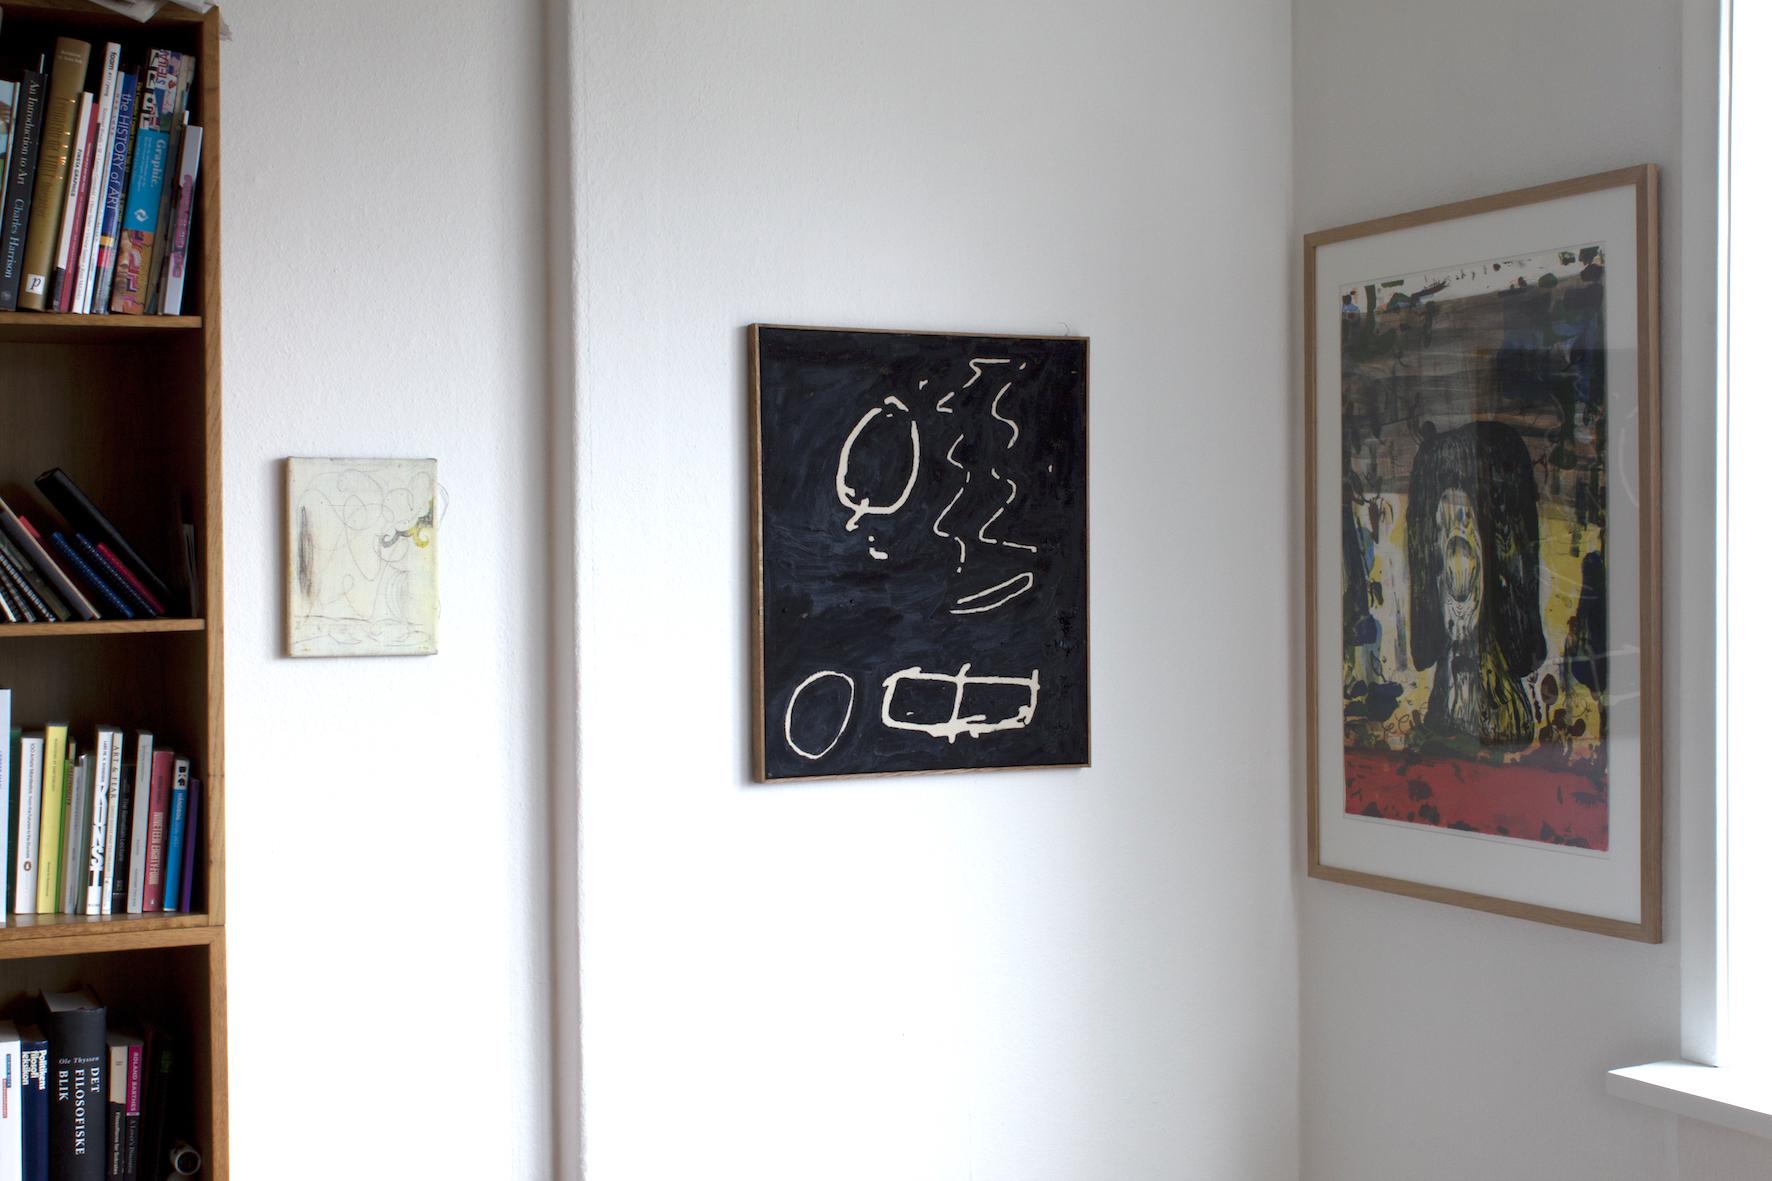 Morten Knudsen, Wolfgang Voegele and Tal R